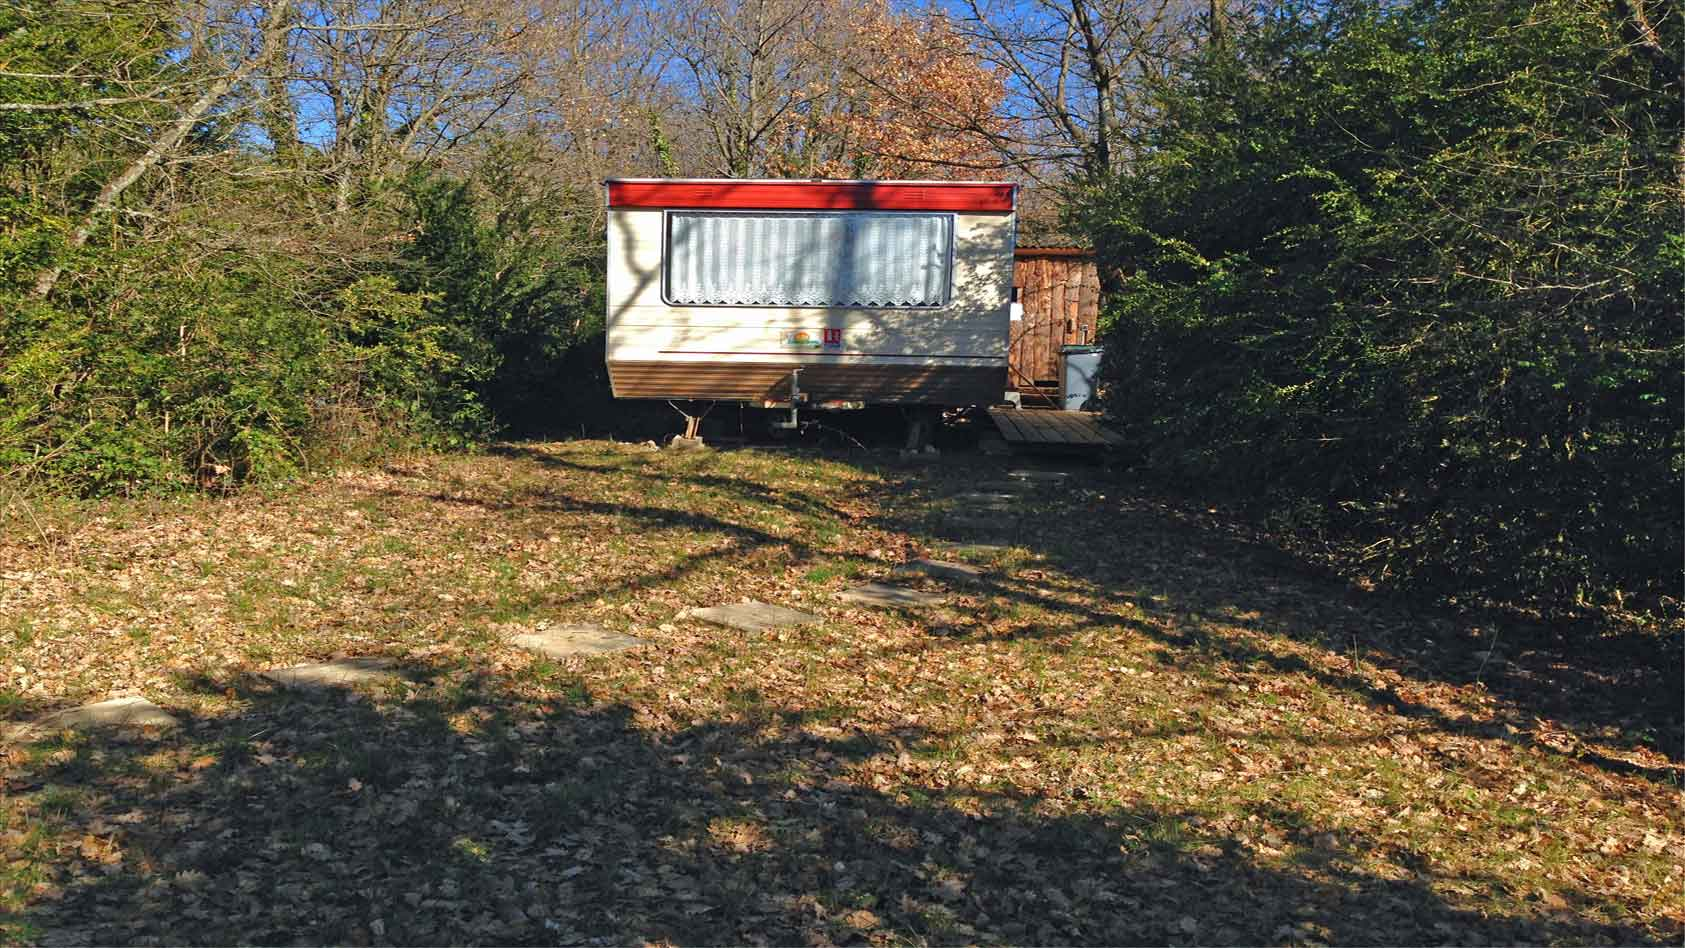 red-caravan-rode-mobil-home-garden-private-WEB